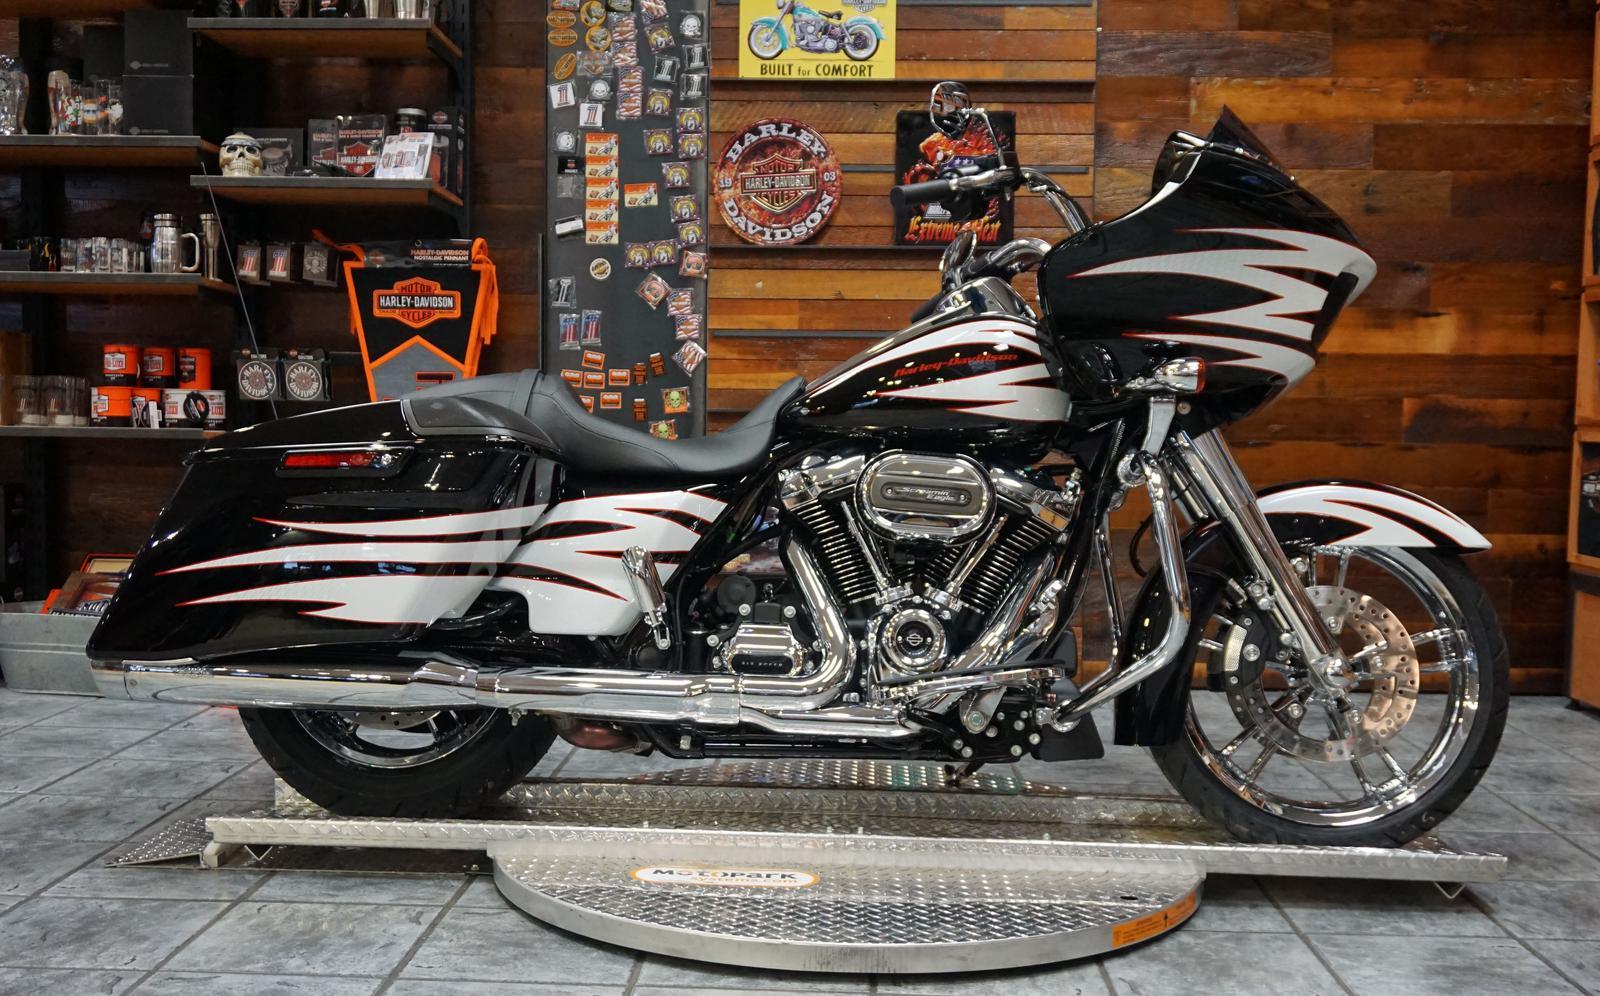 North Cascades Harley Davidson image 3